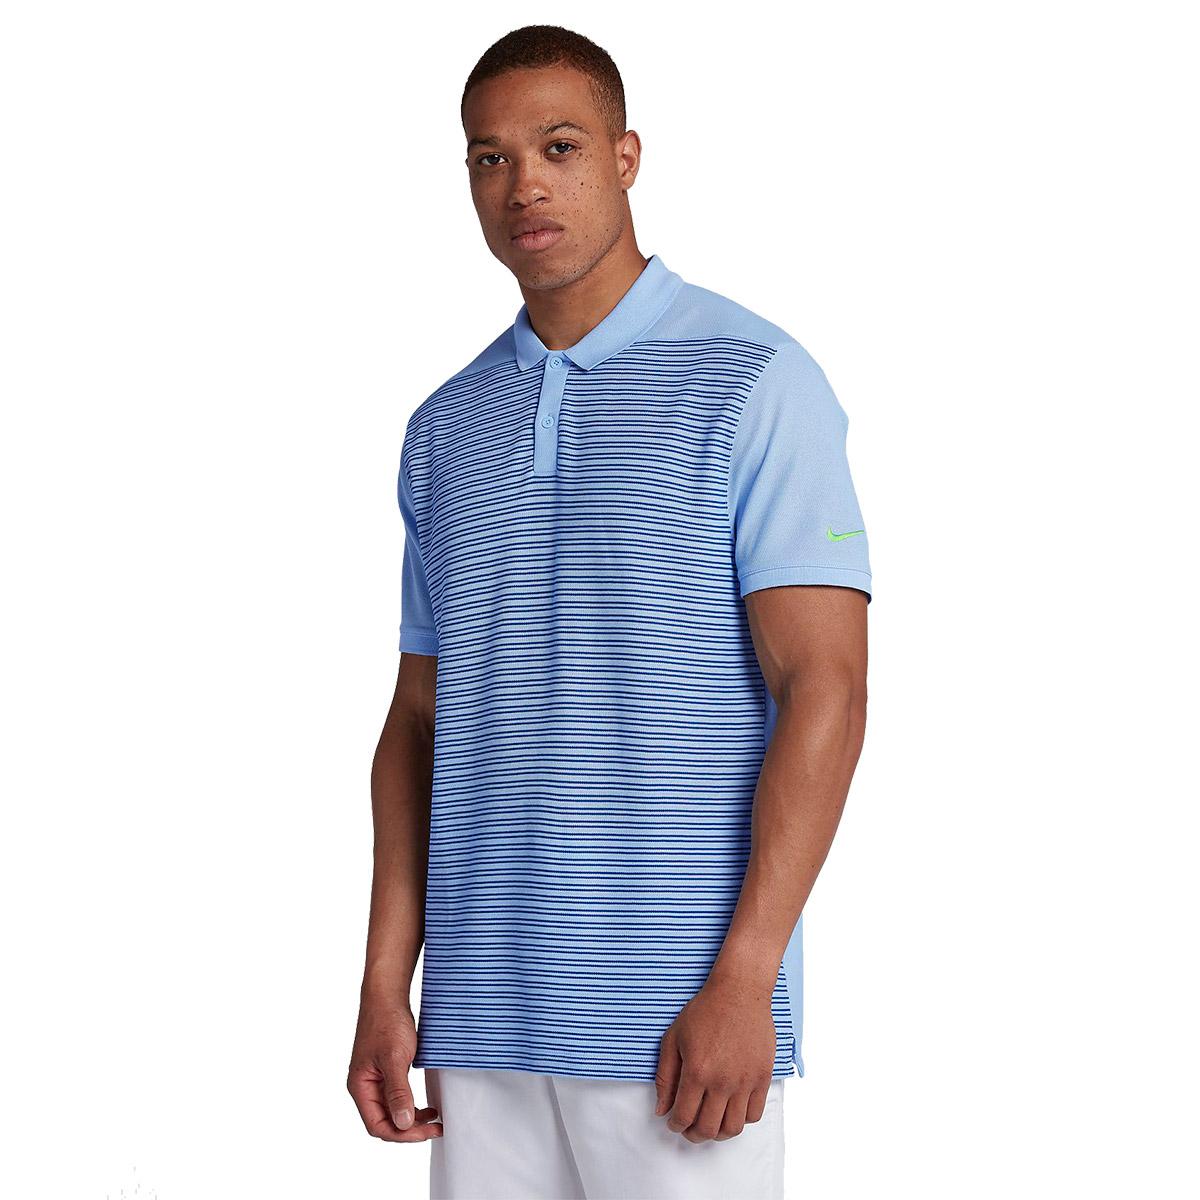 1a0ef046c Nike Golf Classic Stripe Pique Polo Shirt from american golf